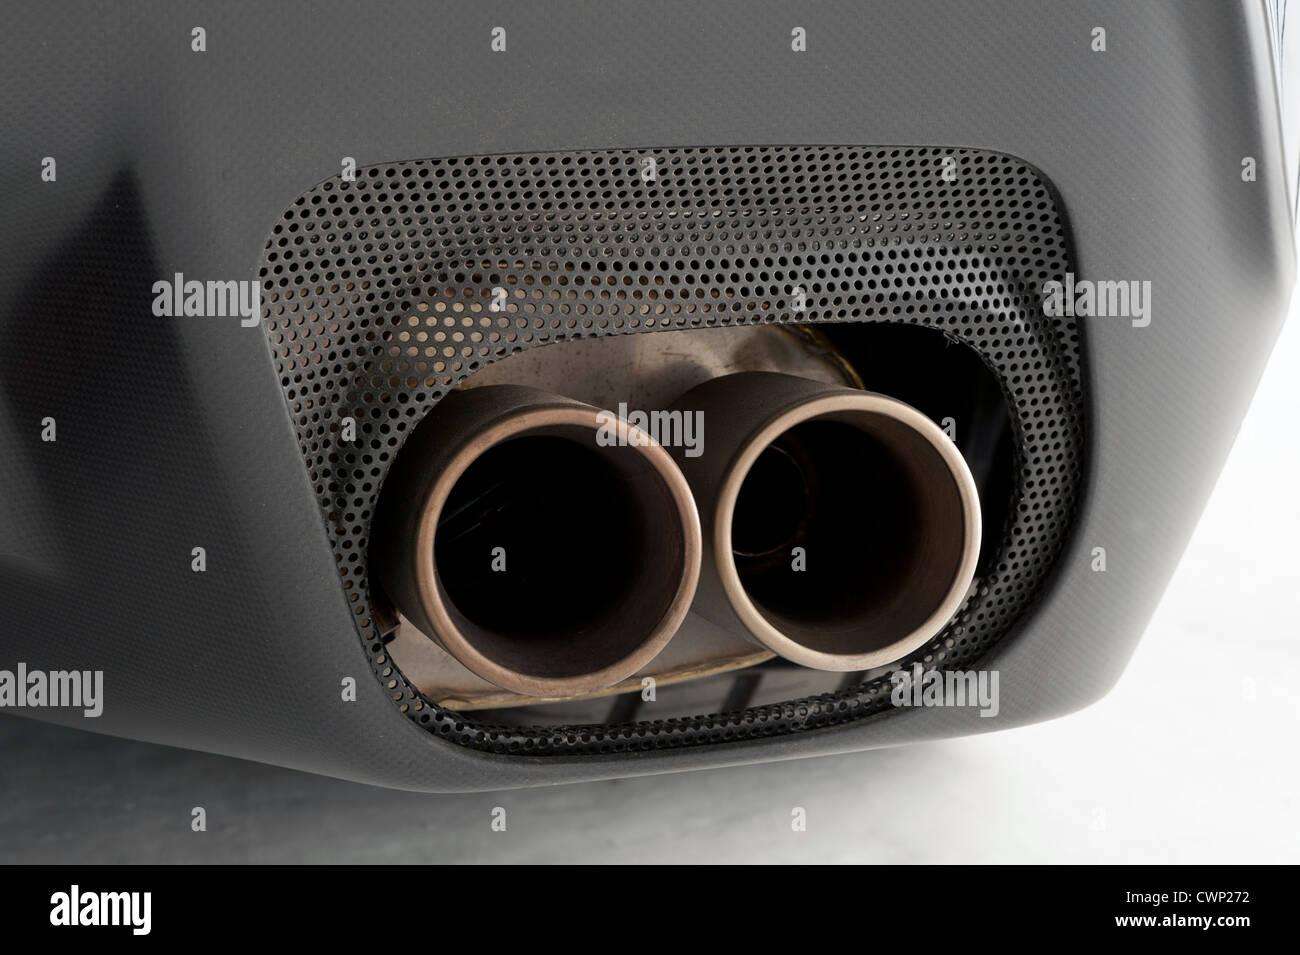 Ferrari 599 GTO 2010 exhaust pipes - Stock Image